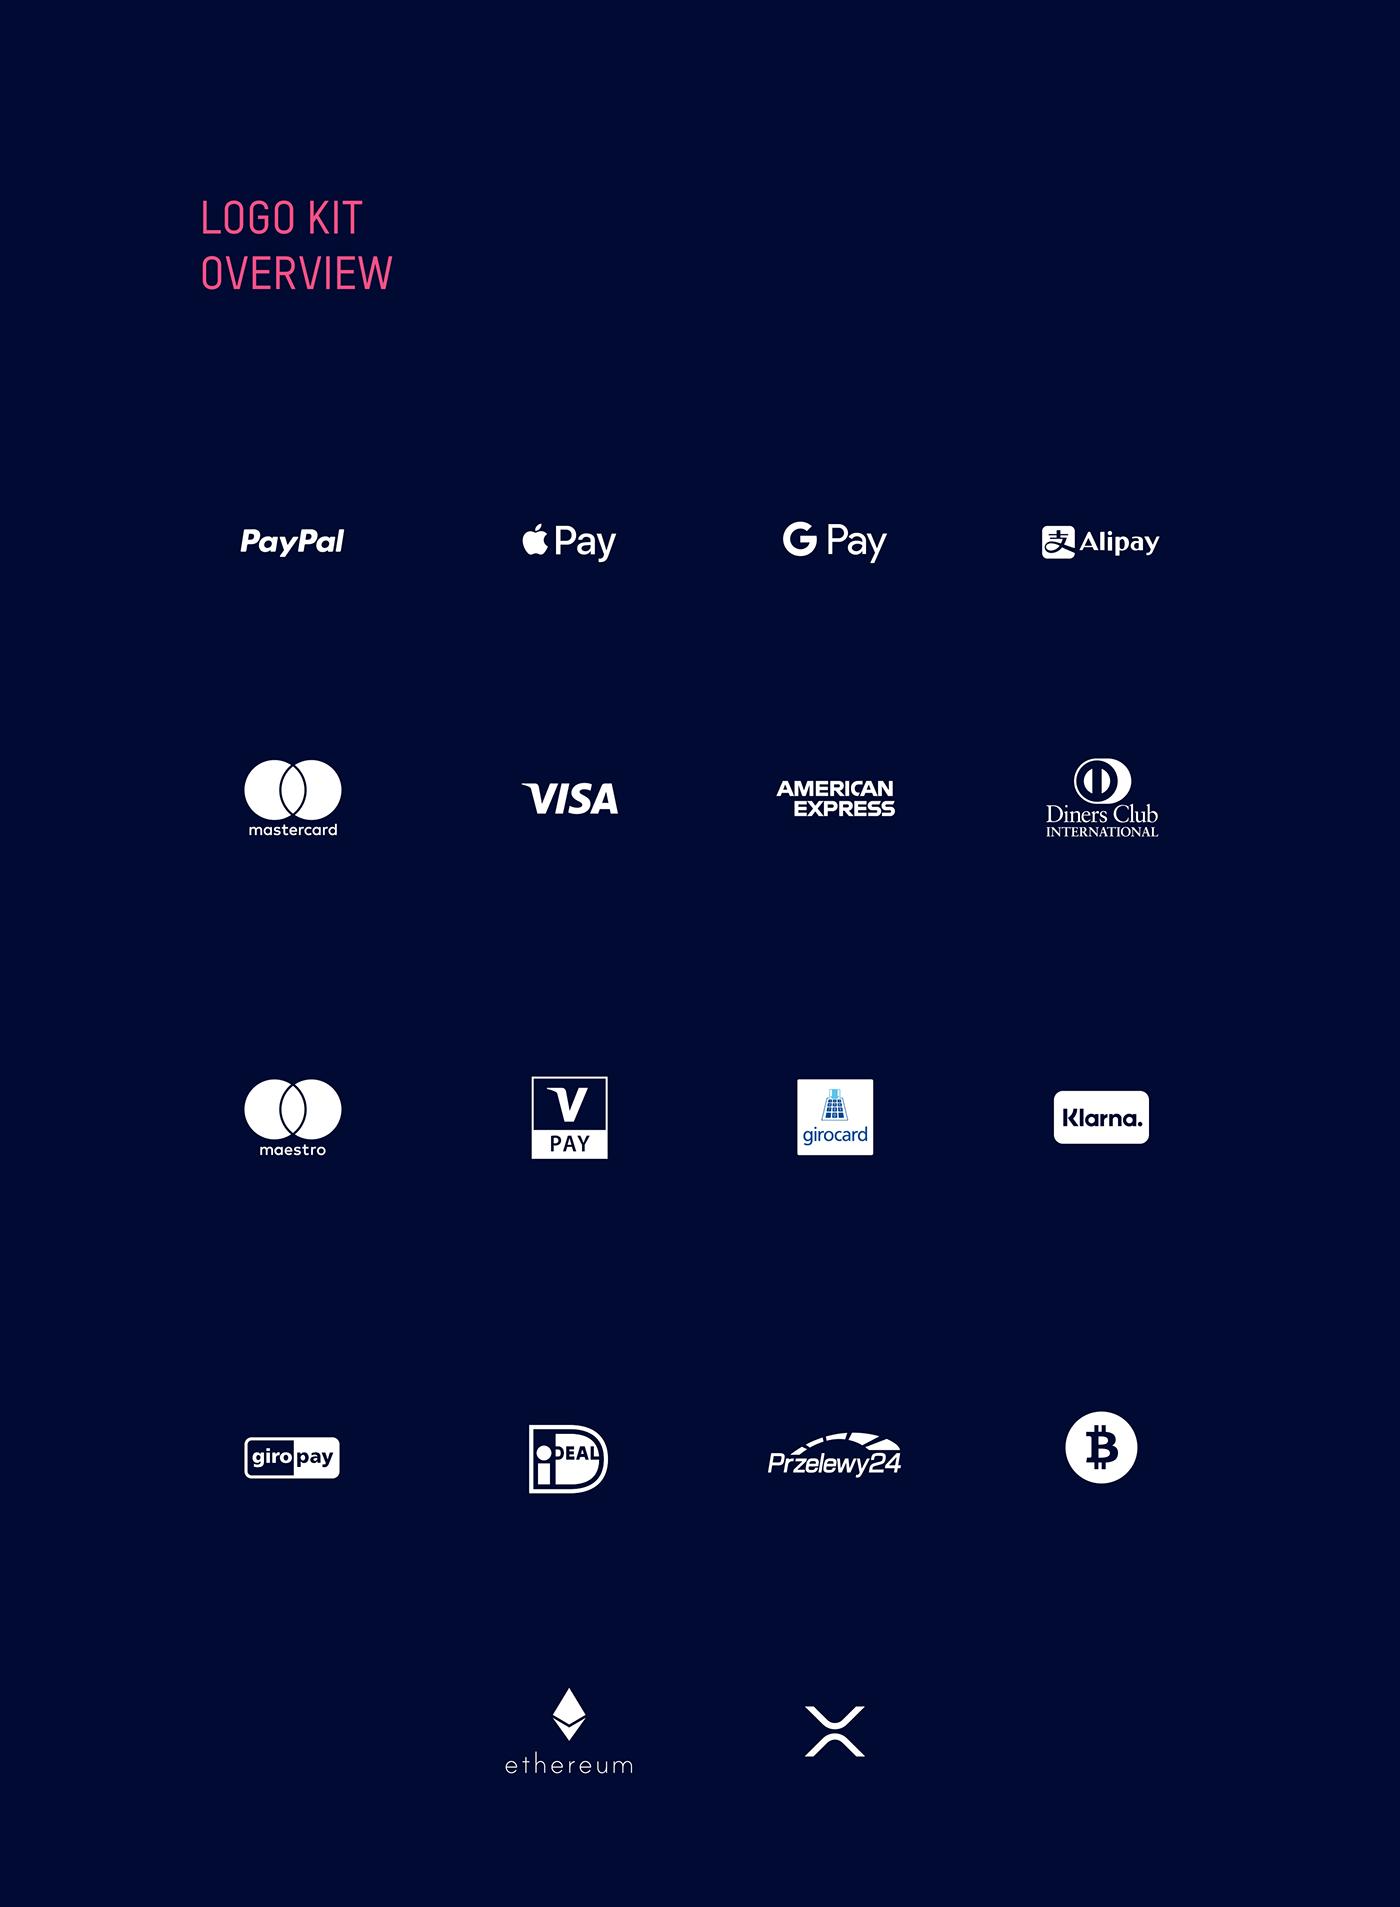 download Ecommerce eWallet free freebie icons kit logos mobile payment